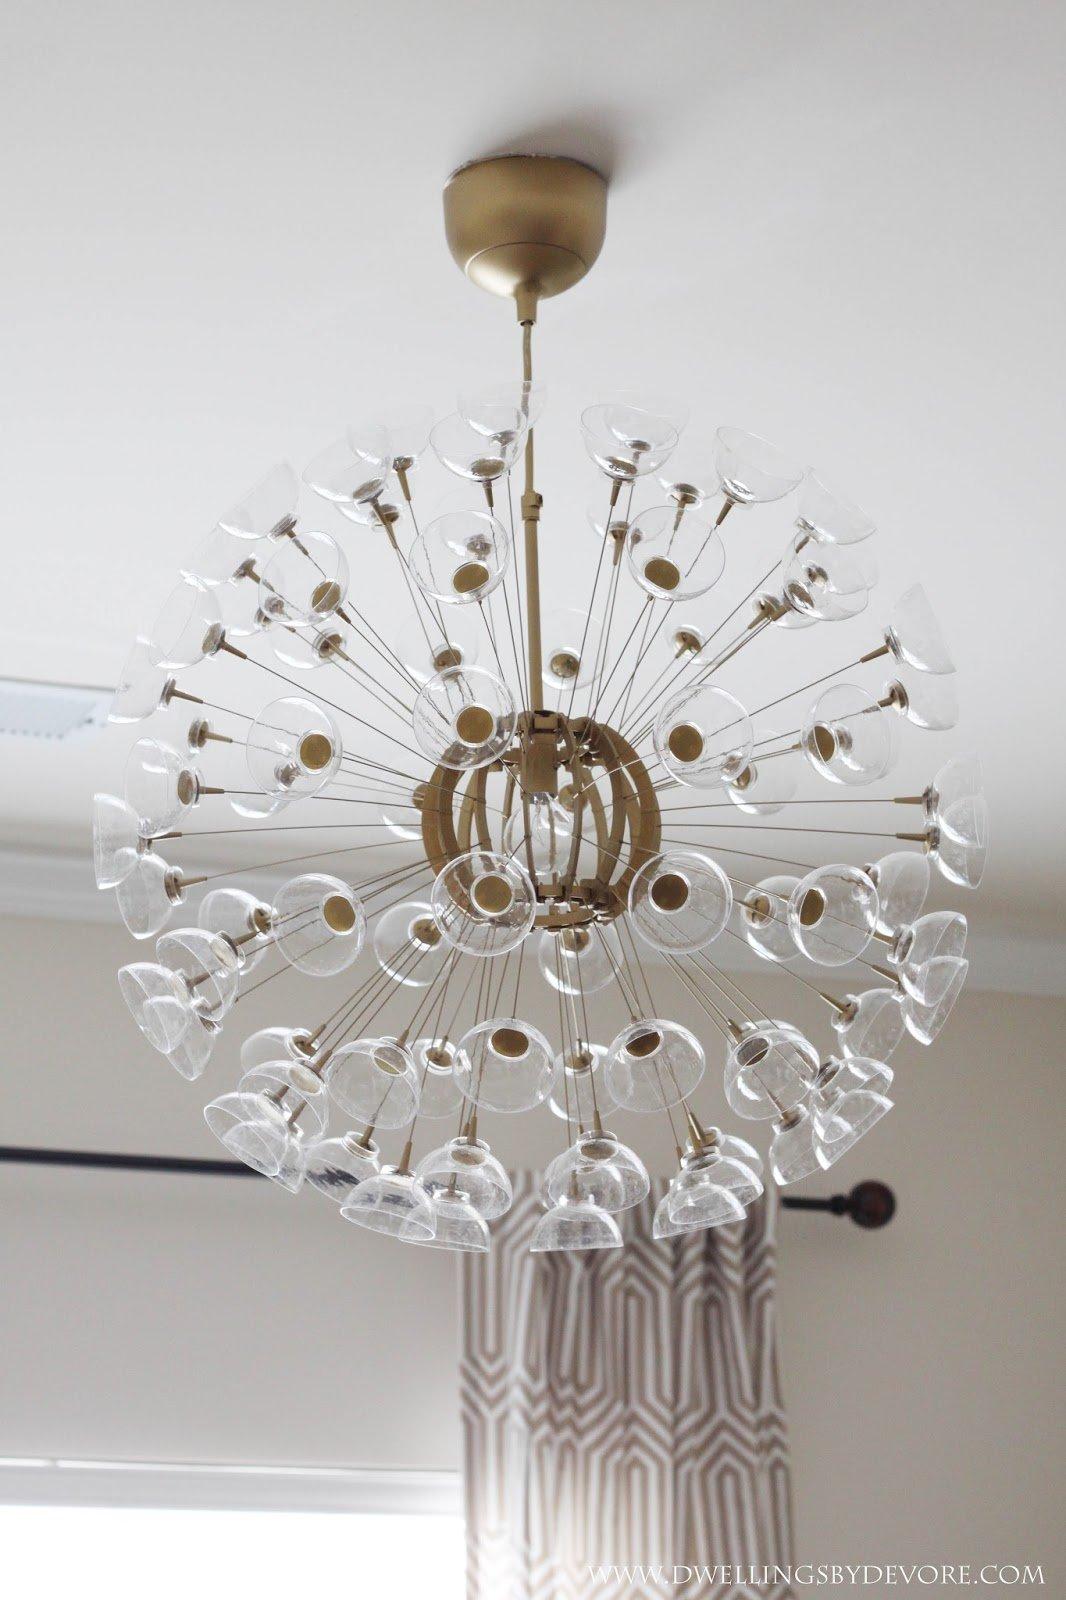 diy sputnik chandelier IKEA hack - Remodelaholic 25+ Gorgeous DIY Chandeliers